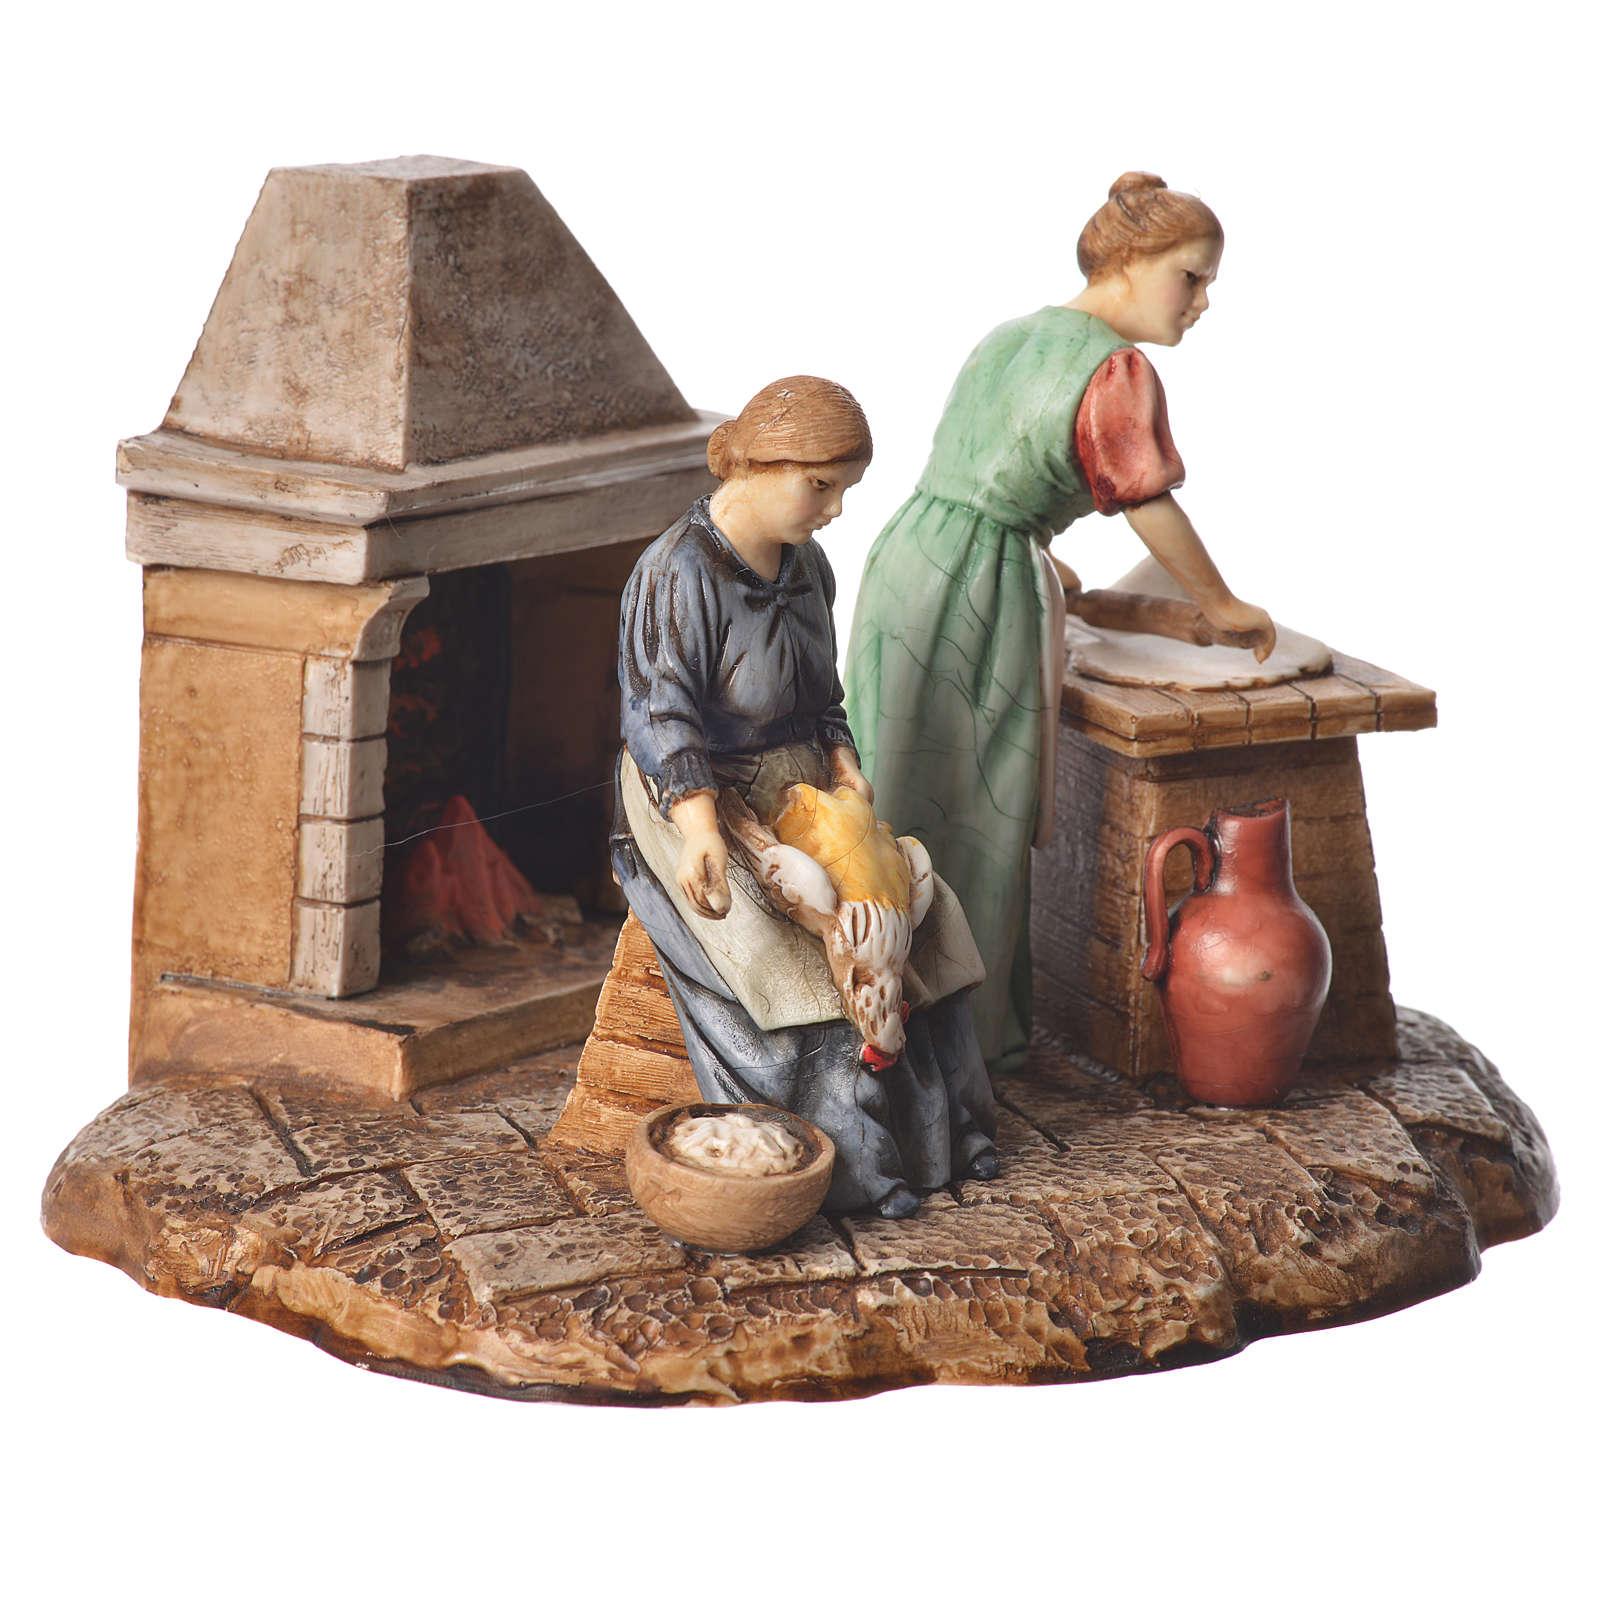 Grupa kuchnia 10 cm Moranduzzo 4